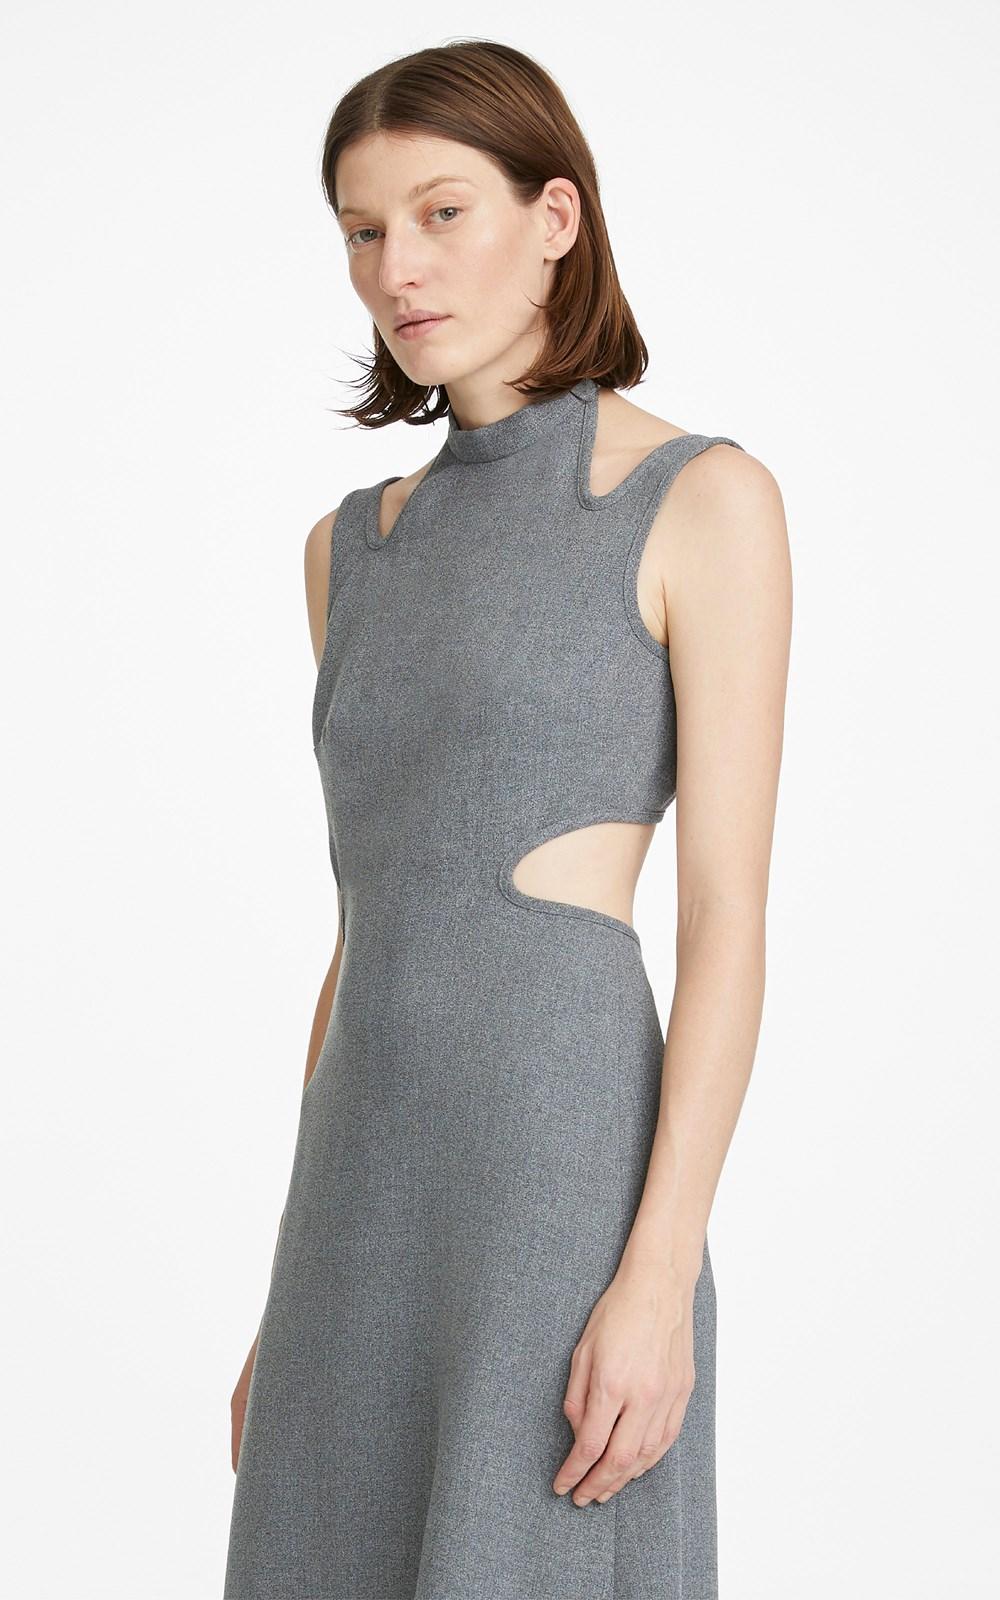 Dresses | DOUBLE TIE MARLE DRESS